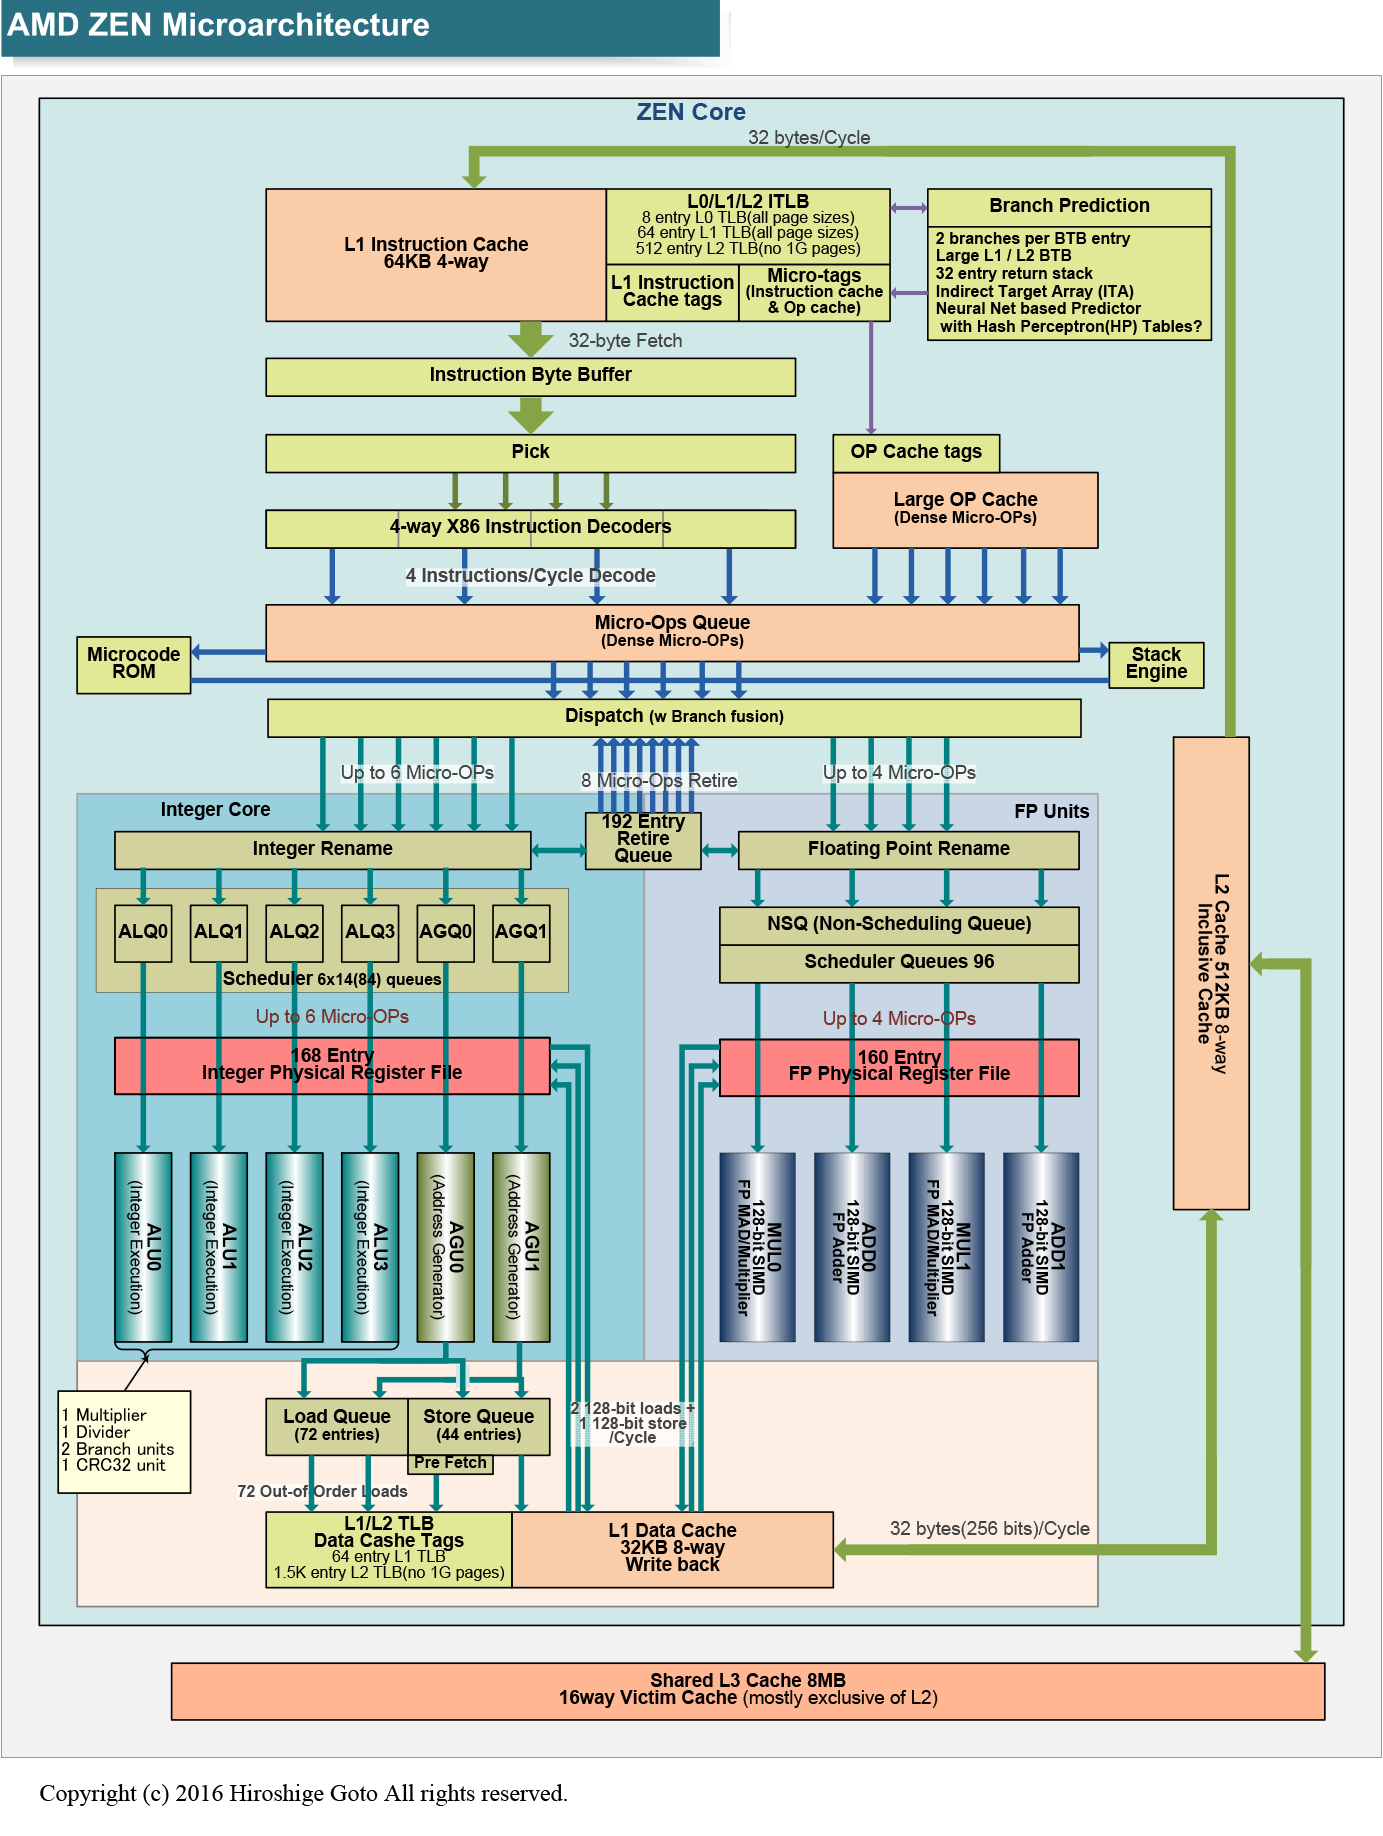 ZENマイクロアーキテクチャ